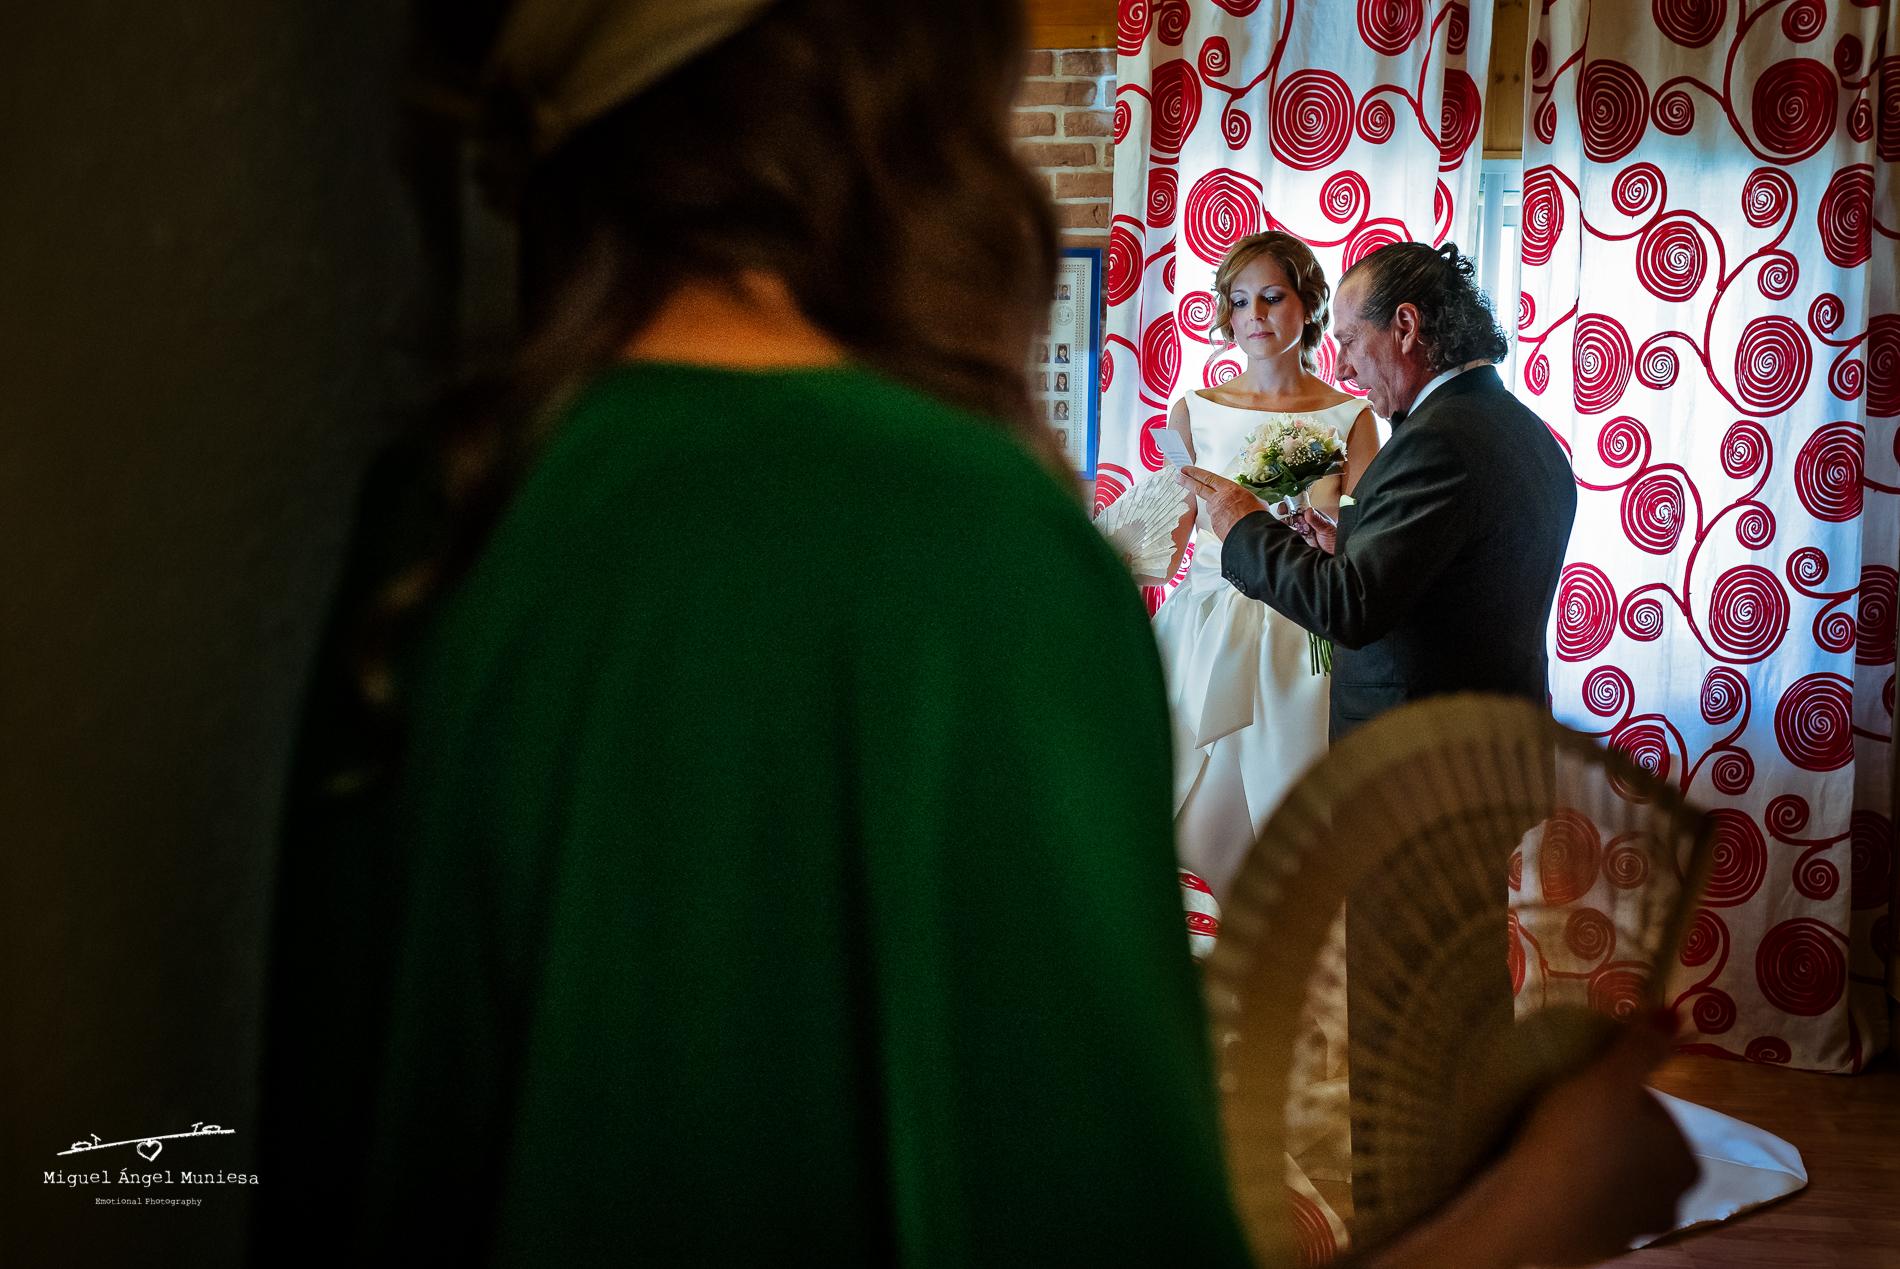 boda, fotografia de boda, boda zaragoza, fotografia, wedding, wedding photography, miguel angel muniesa, fotografo boda Zaragoza, fotografo boda, destination wedding_ 018